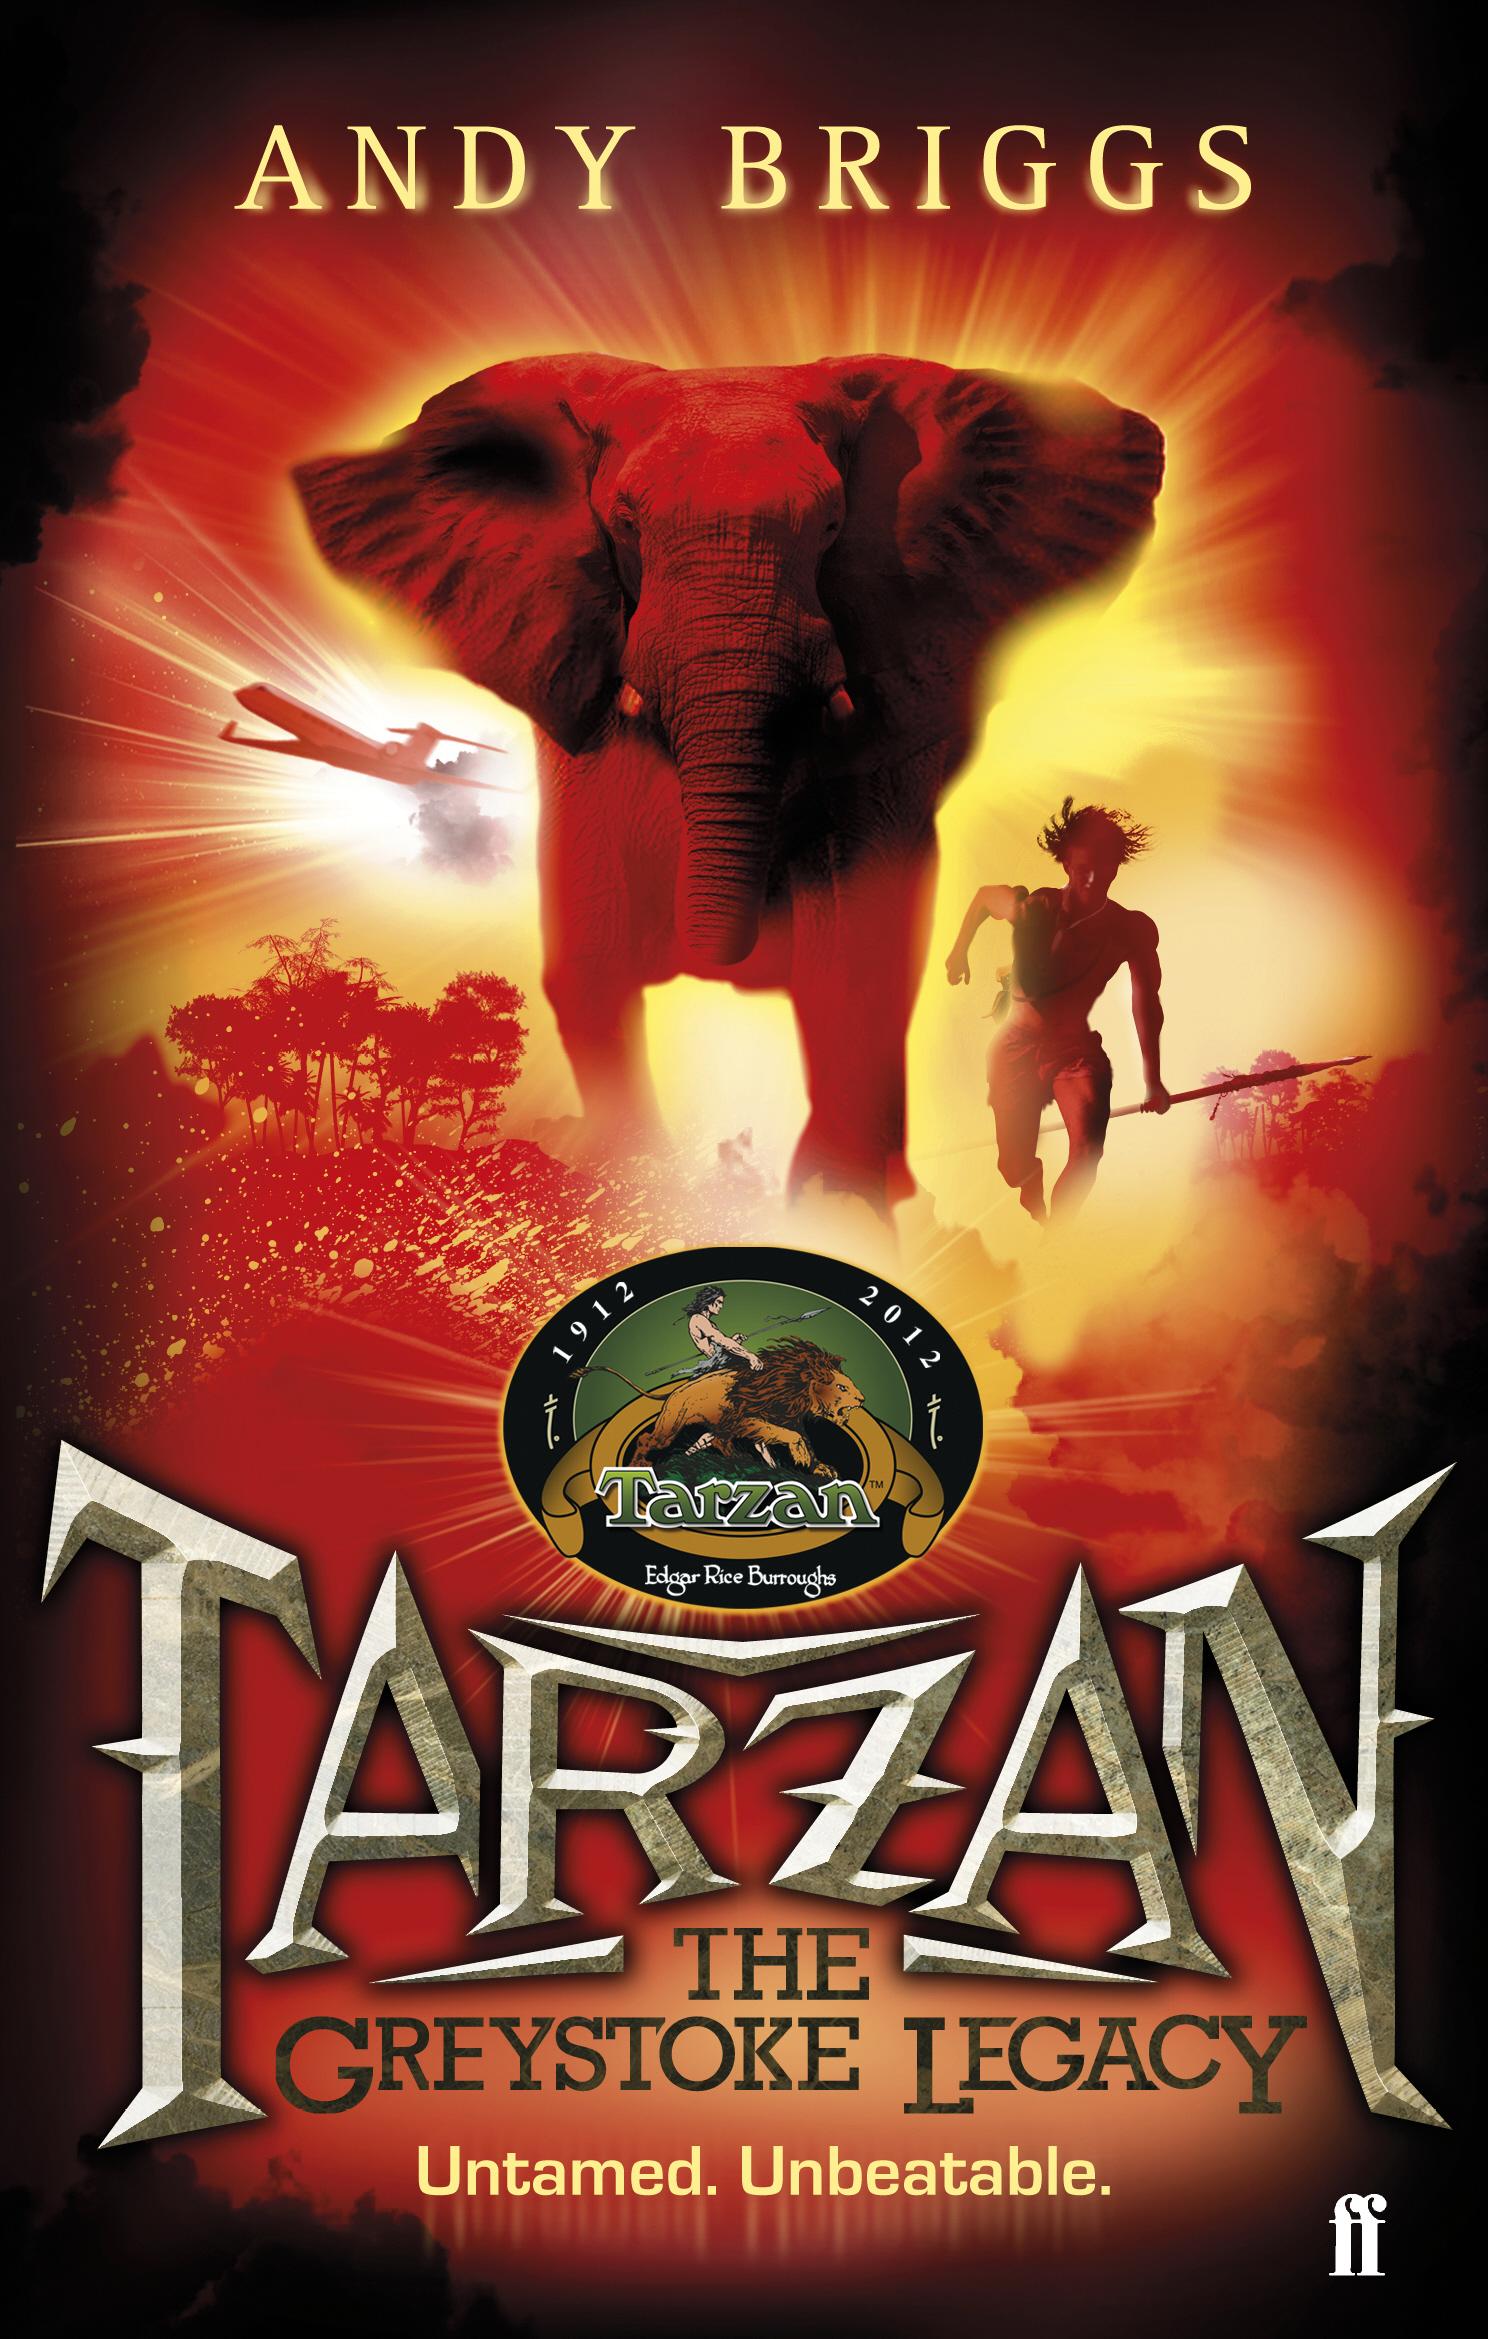 [BRIGGS] TARZAN The Greystoke Legacy - UK, Faber final [front].jpg